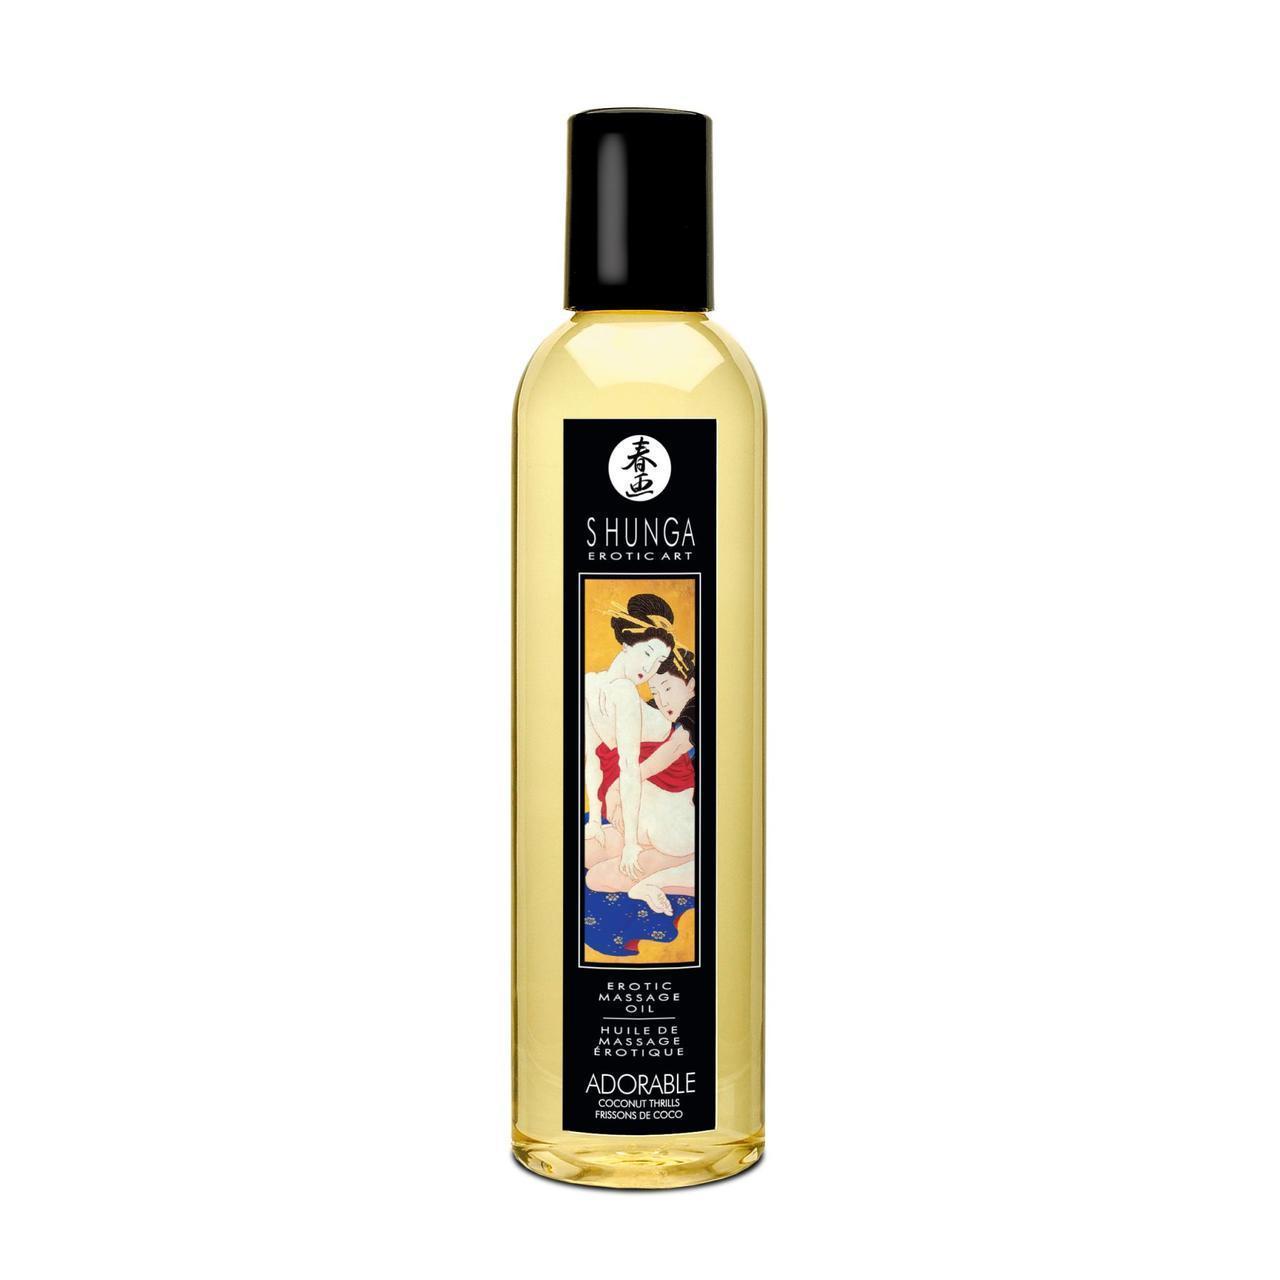 Масажне масло Shunga Adorable - Coconut thrills (250 мл) натуральне зволожуюче     18+